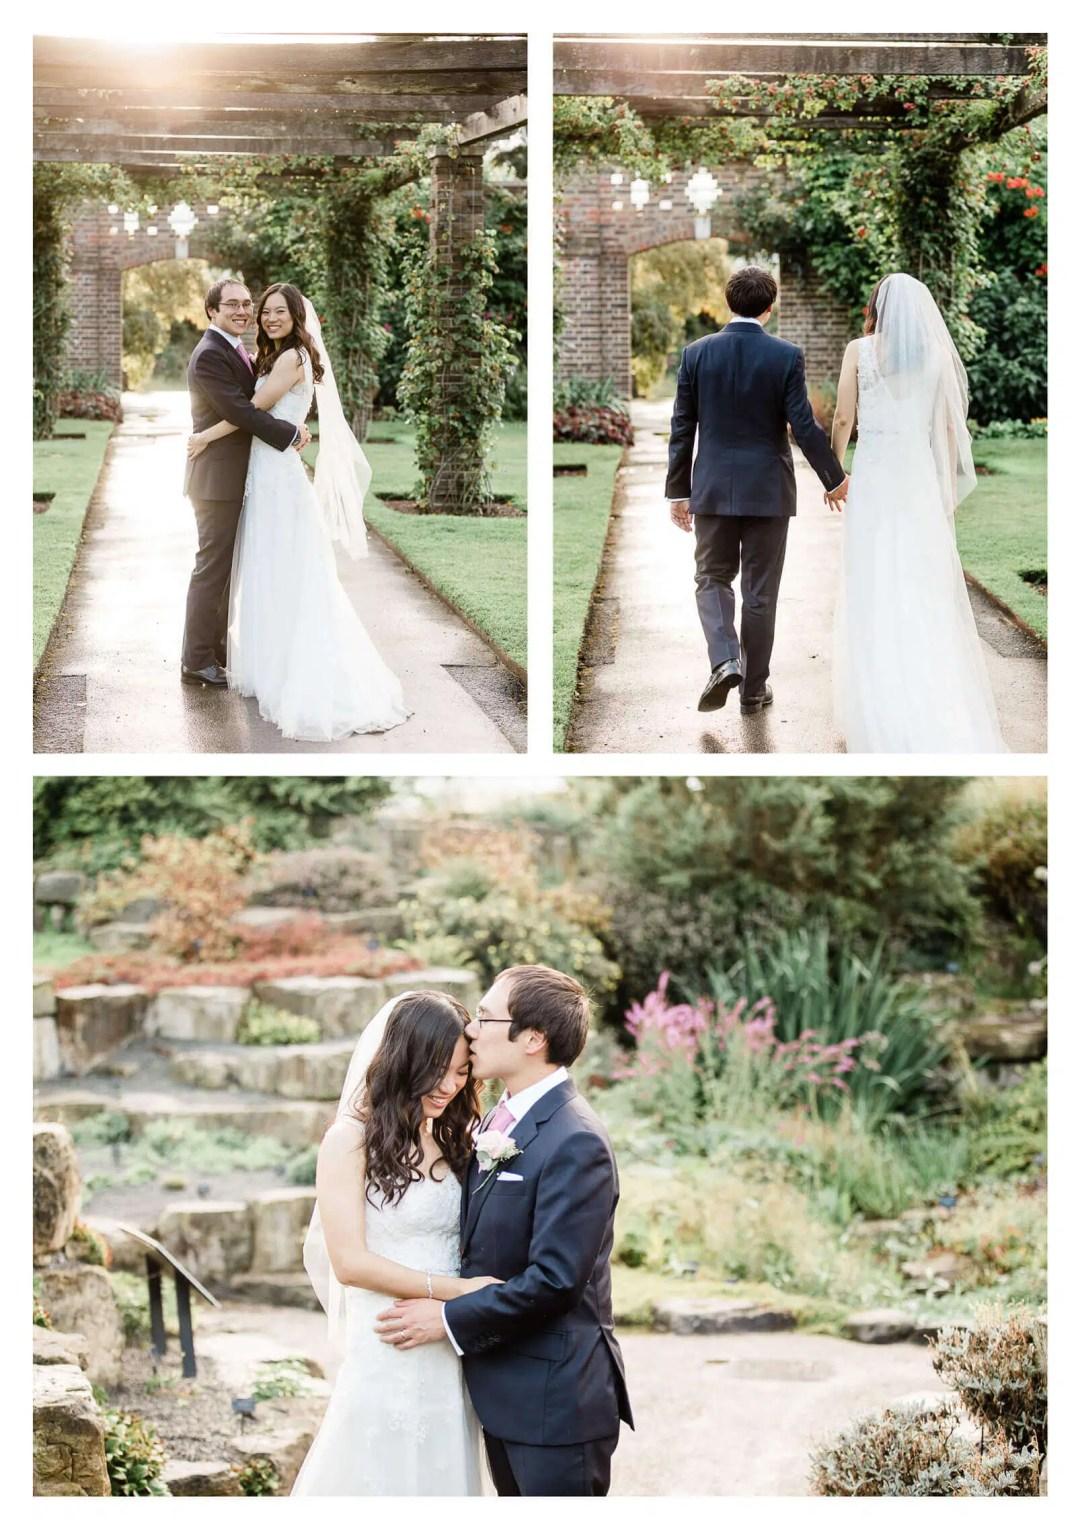 Wilden Bride wedding dress couple portraits at Kew Gardens   London photographer